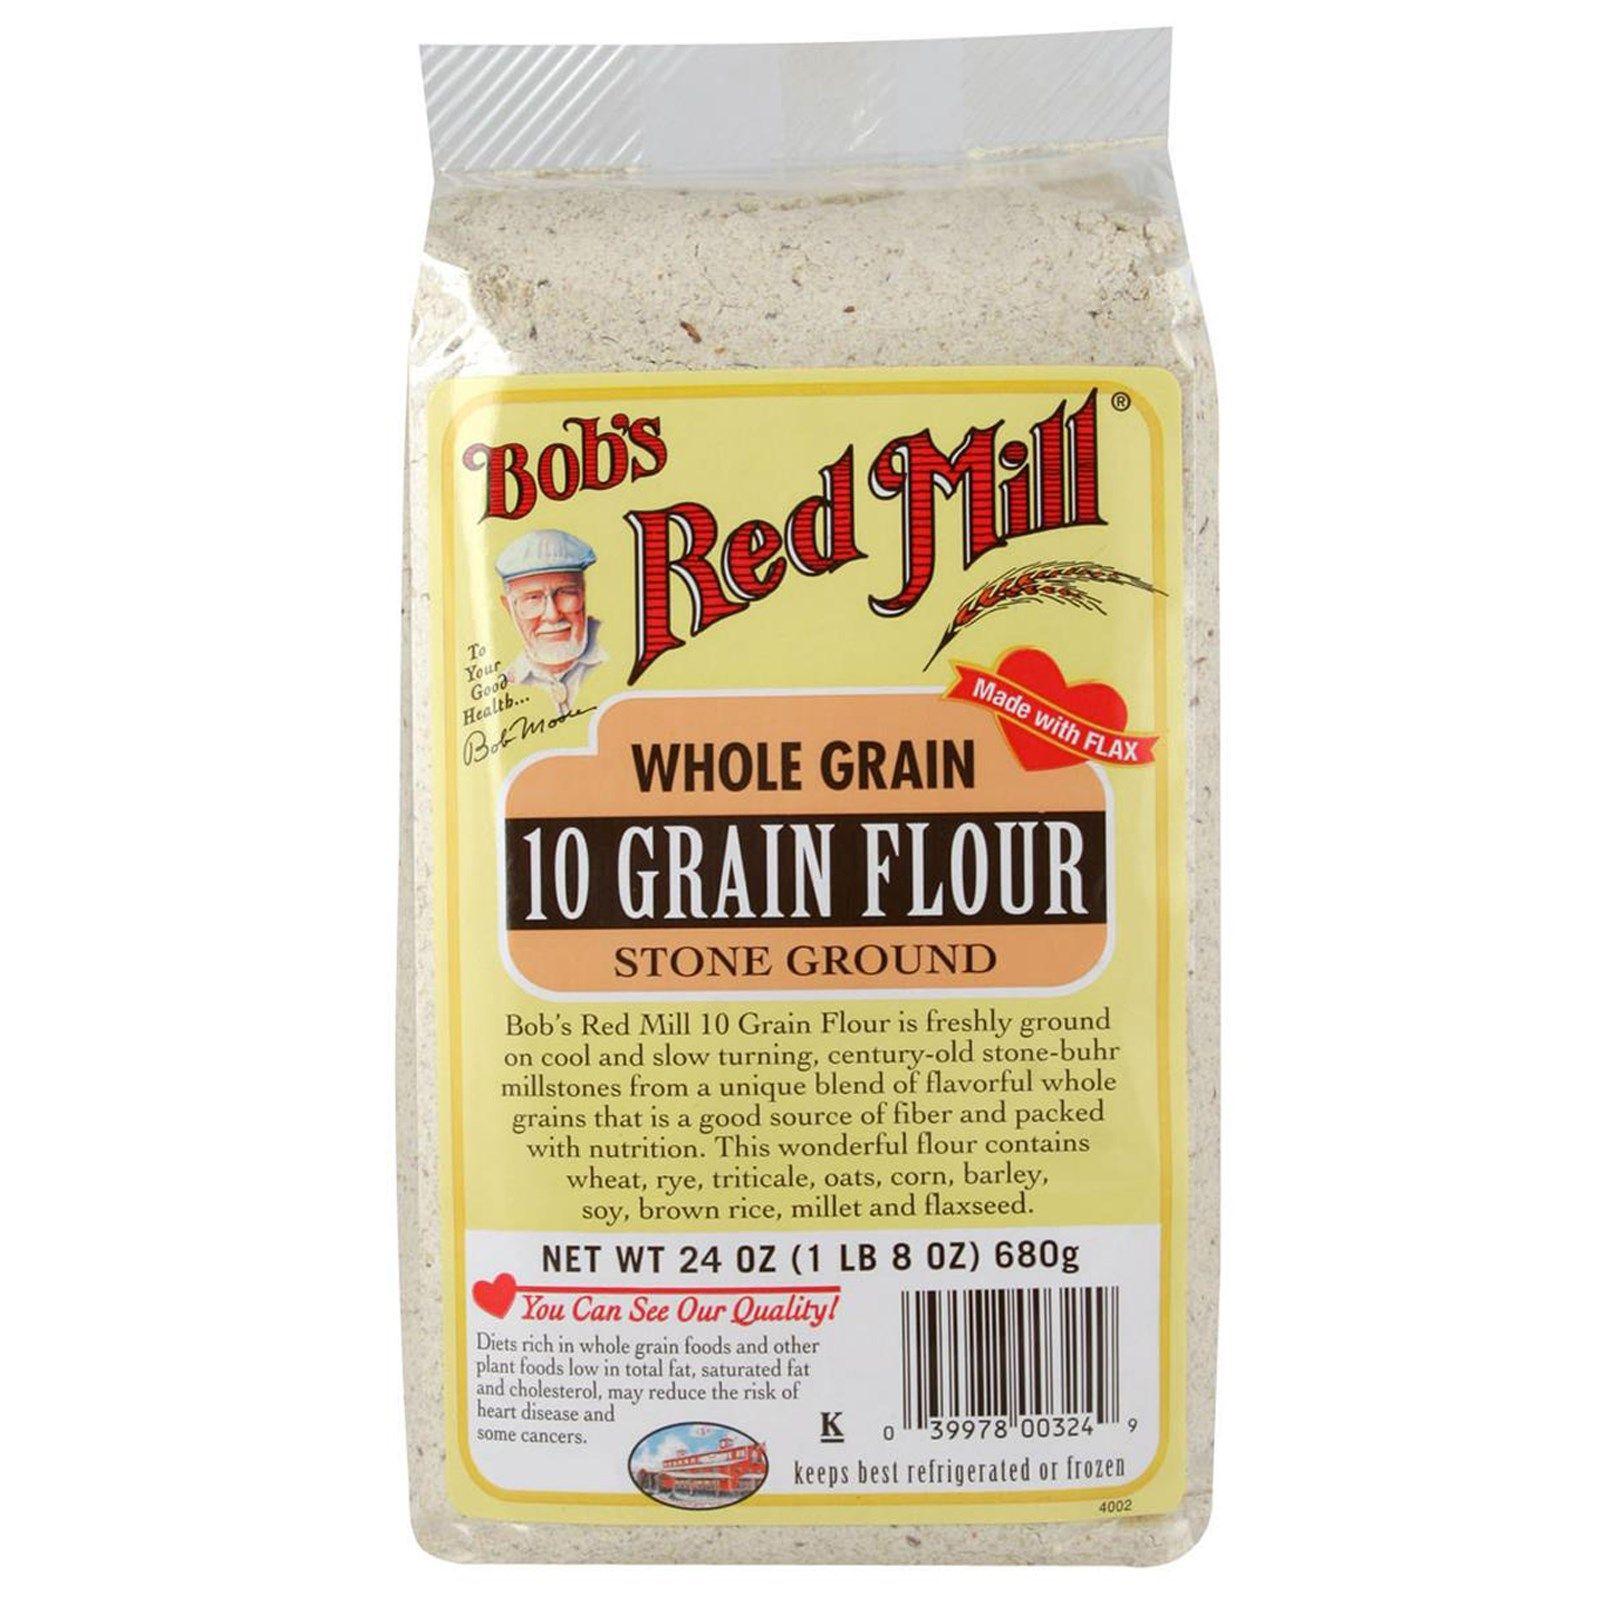 Bob's Red Mill, 10 Grain Flour, Whole Grain, 24 oz (680 g